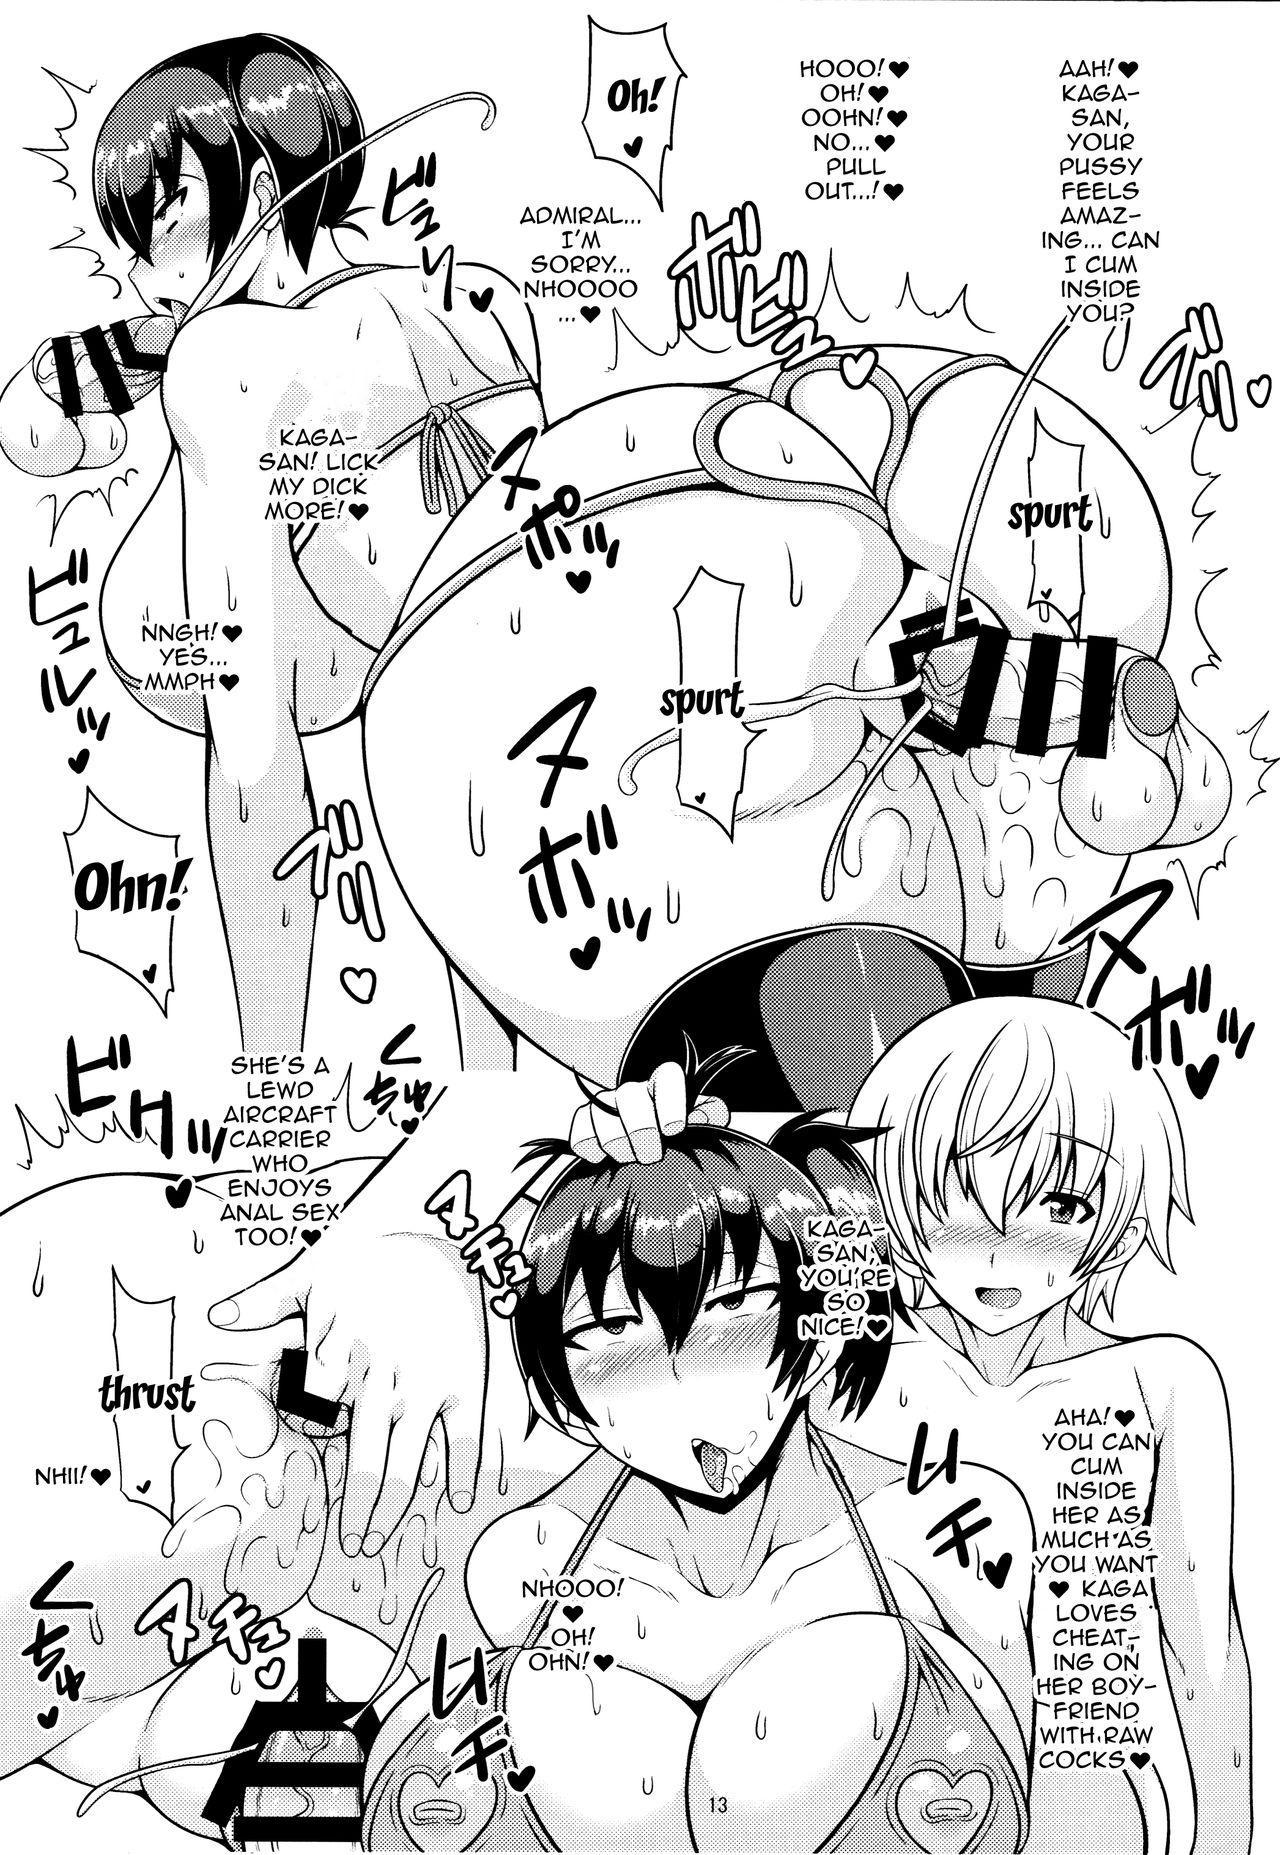 Kaga-san ga ShotaChin de Nhoo suru Hon Kai   A Book About A Shota Cock Making Kaga Moan 11